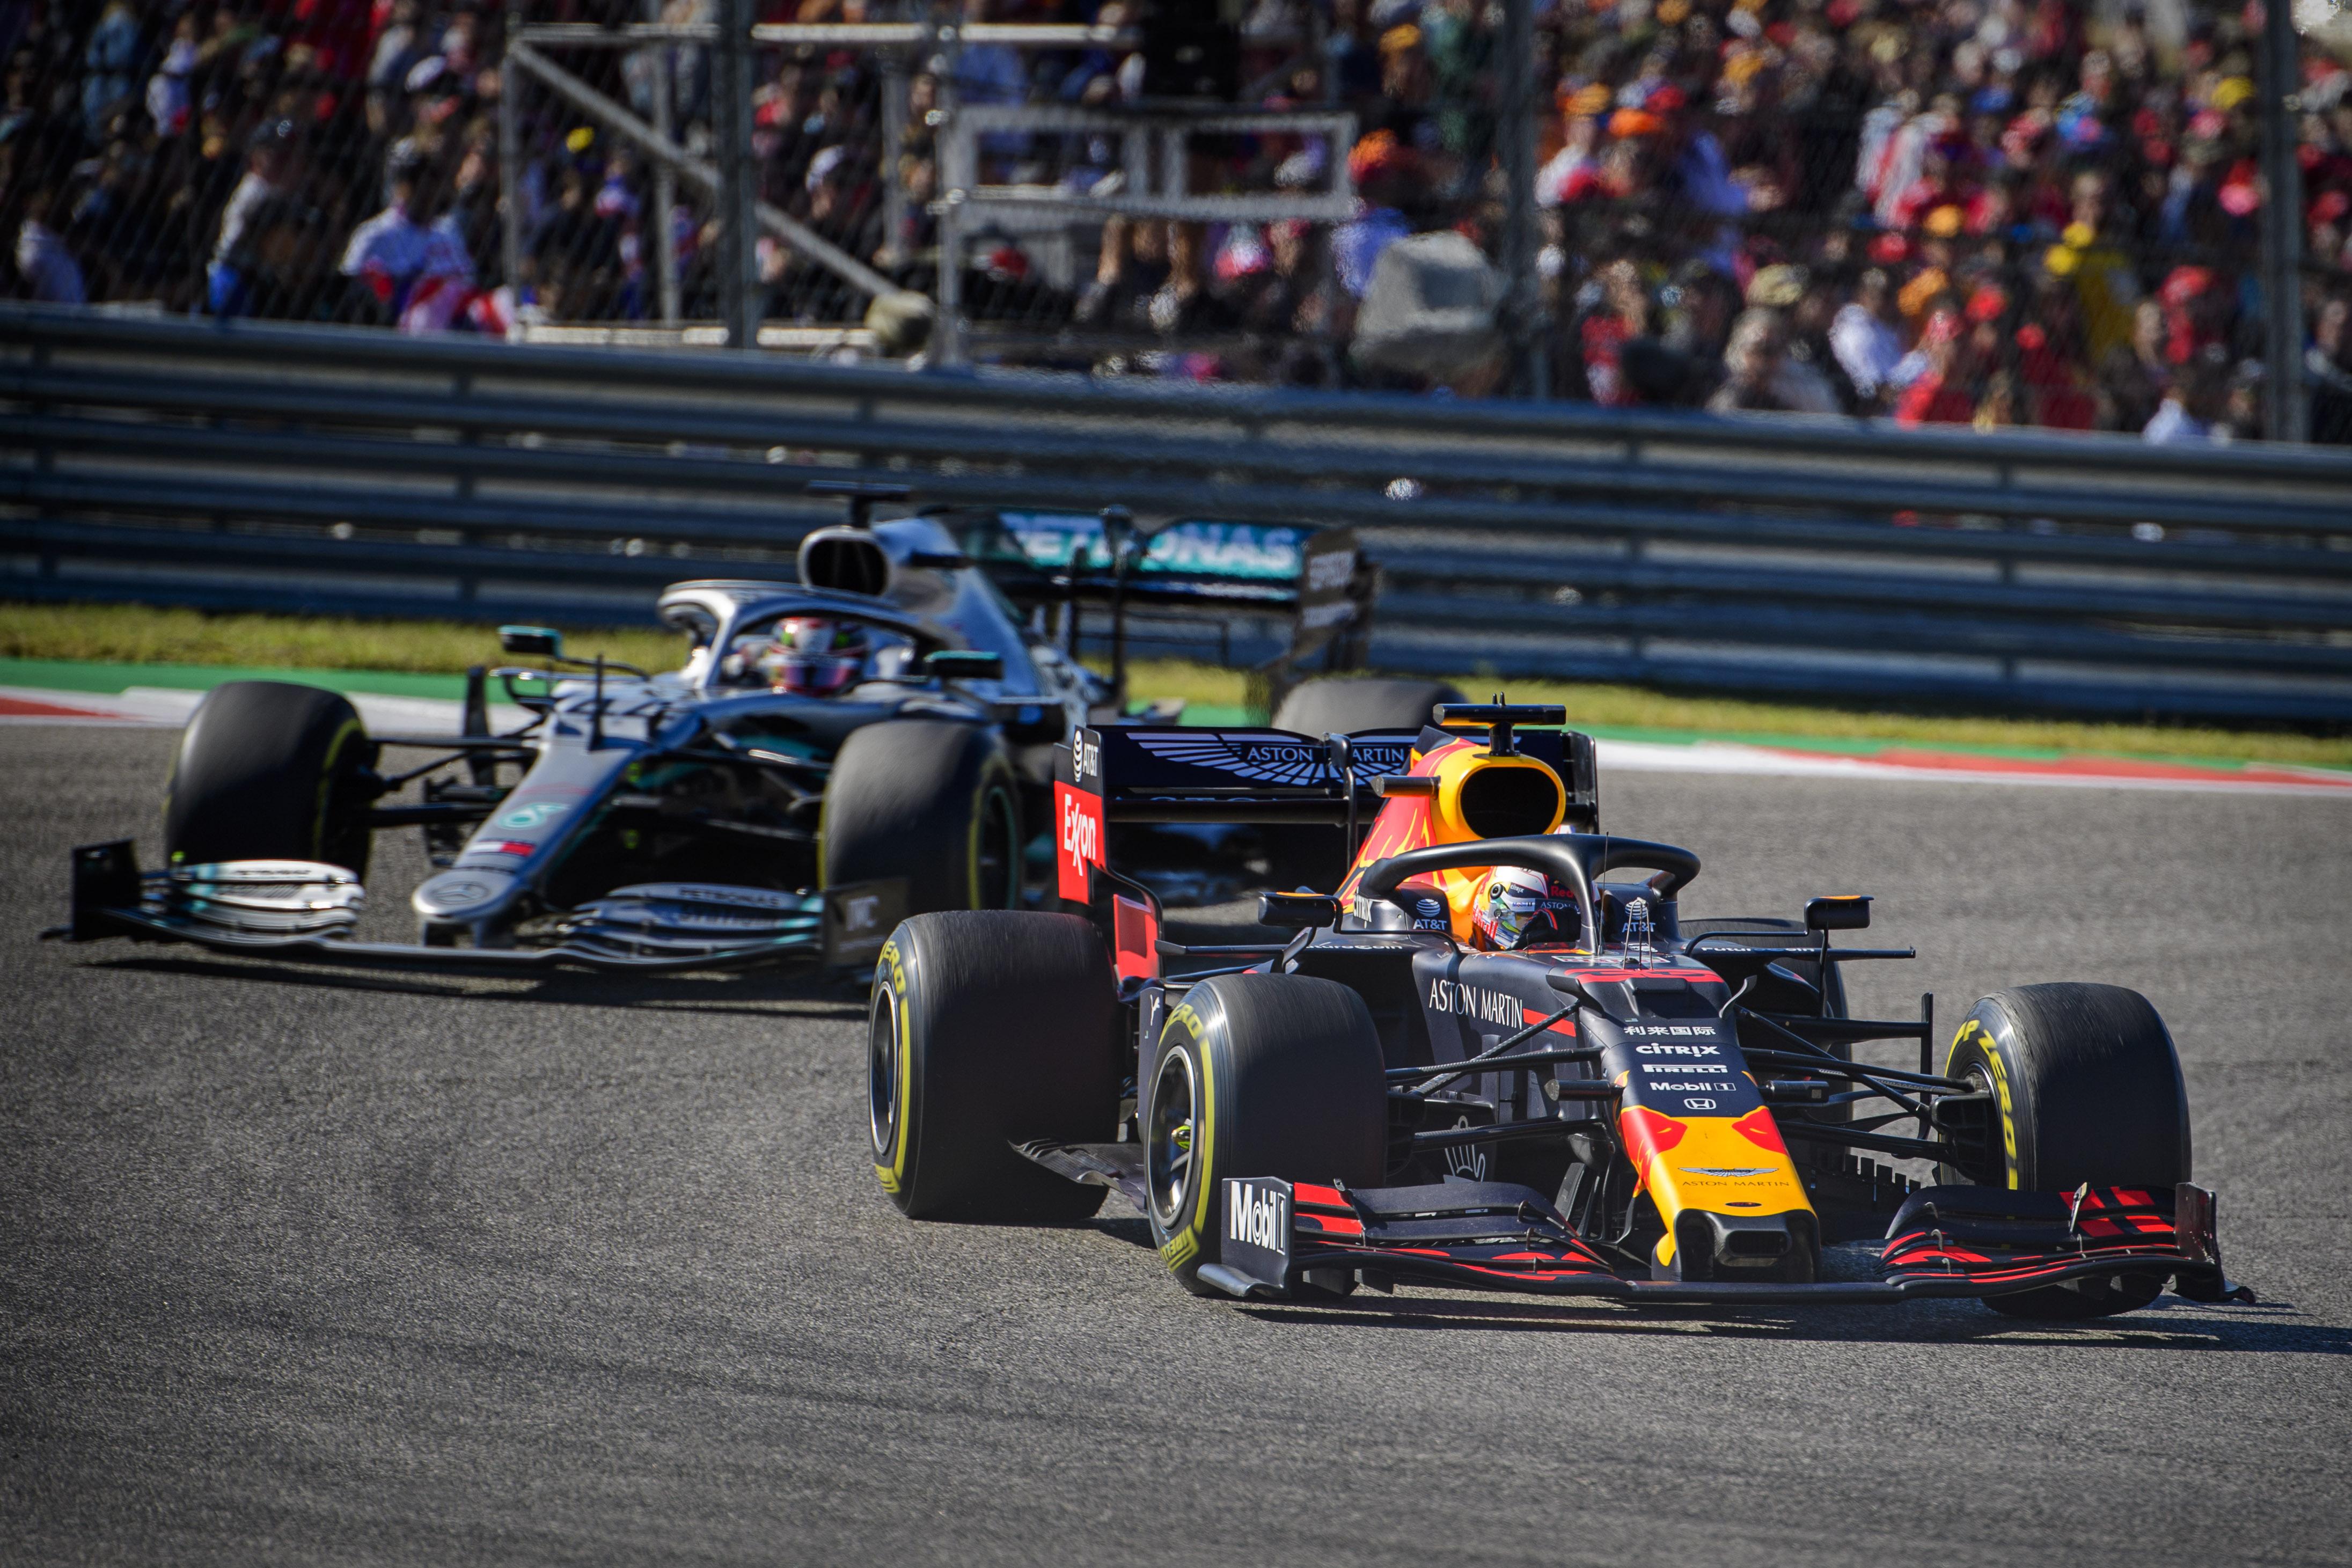 F1 Season 2021 Promises Guaranteed Action but no Guaranteed Audience